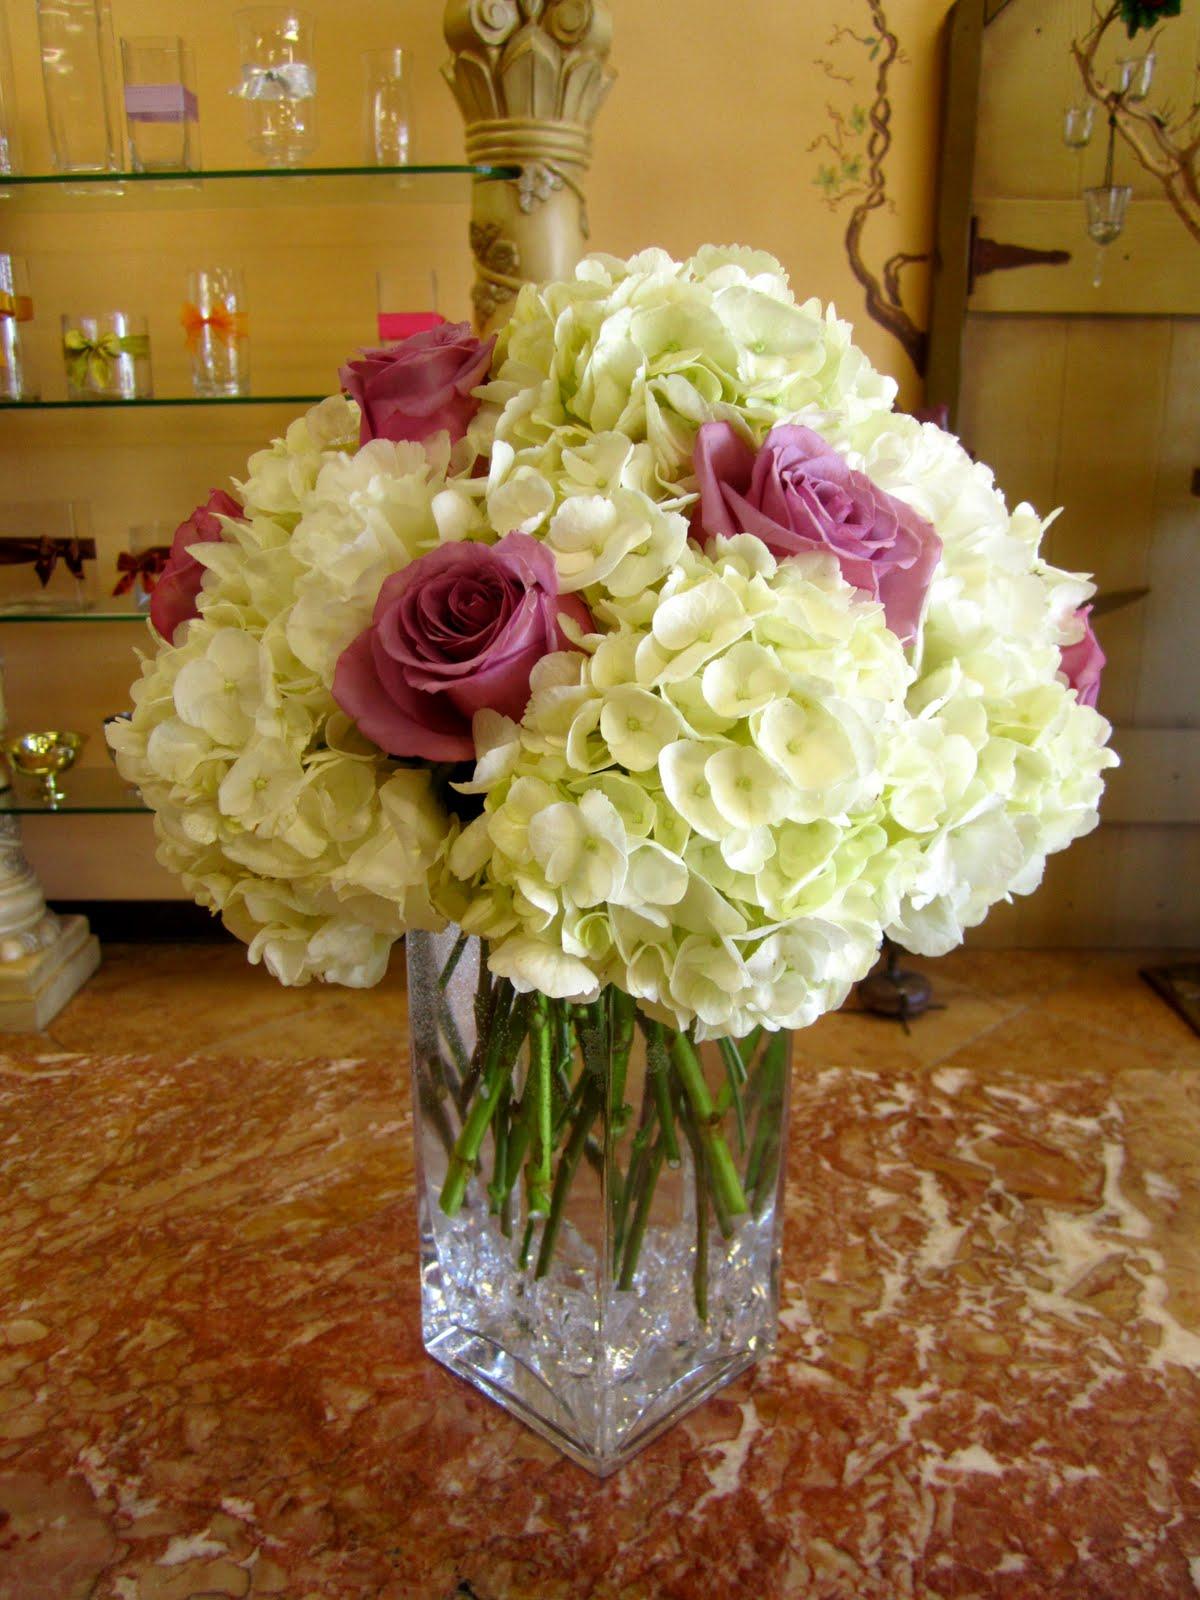 Bernardo s flowers rose hydrangea square glass vase arr